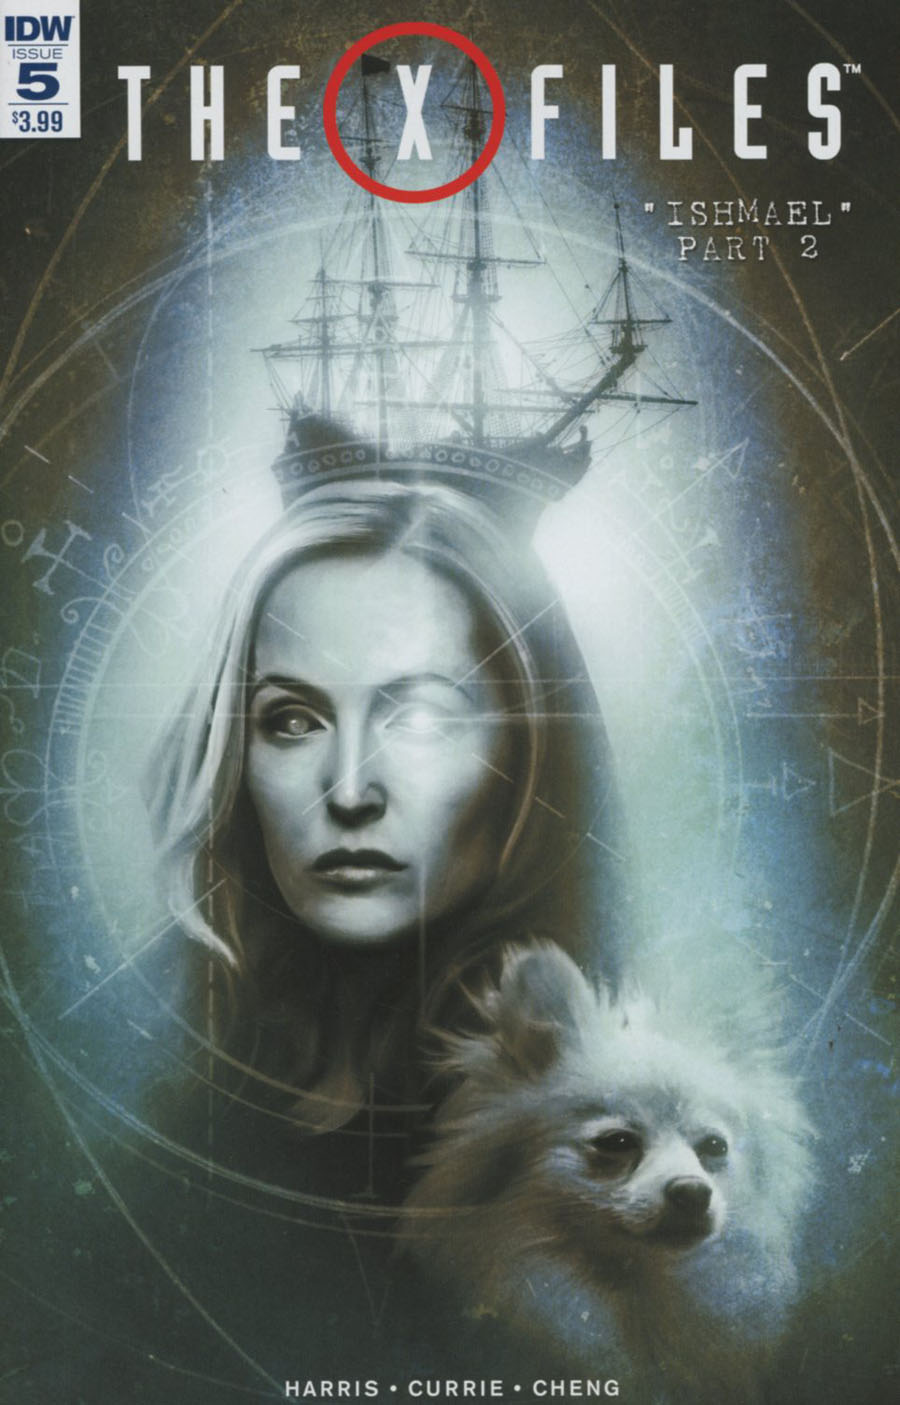 X-Files Vol 3 #5 Cover A Regular Menton3 Cover